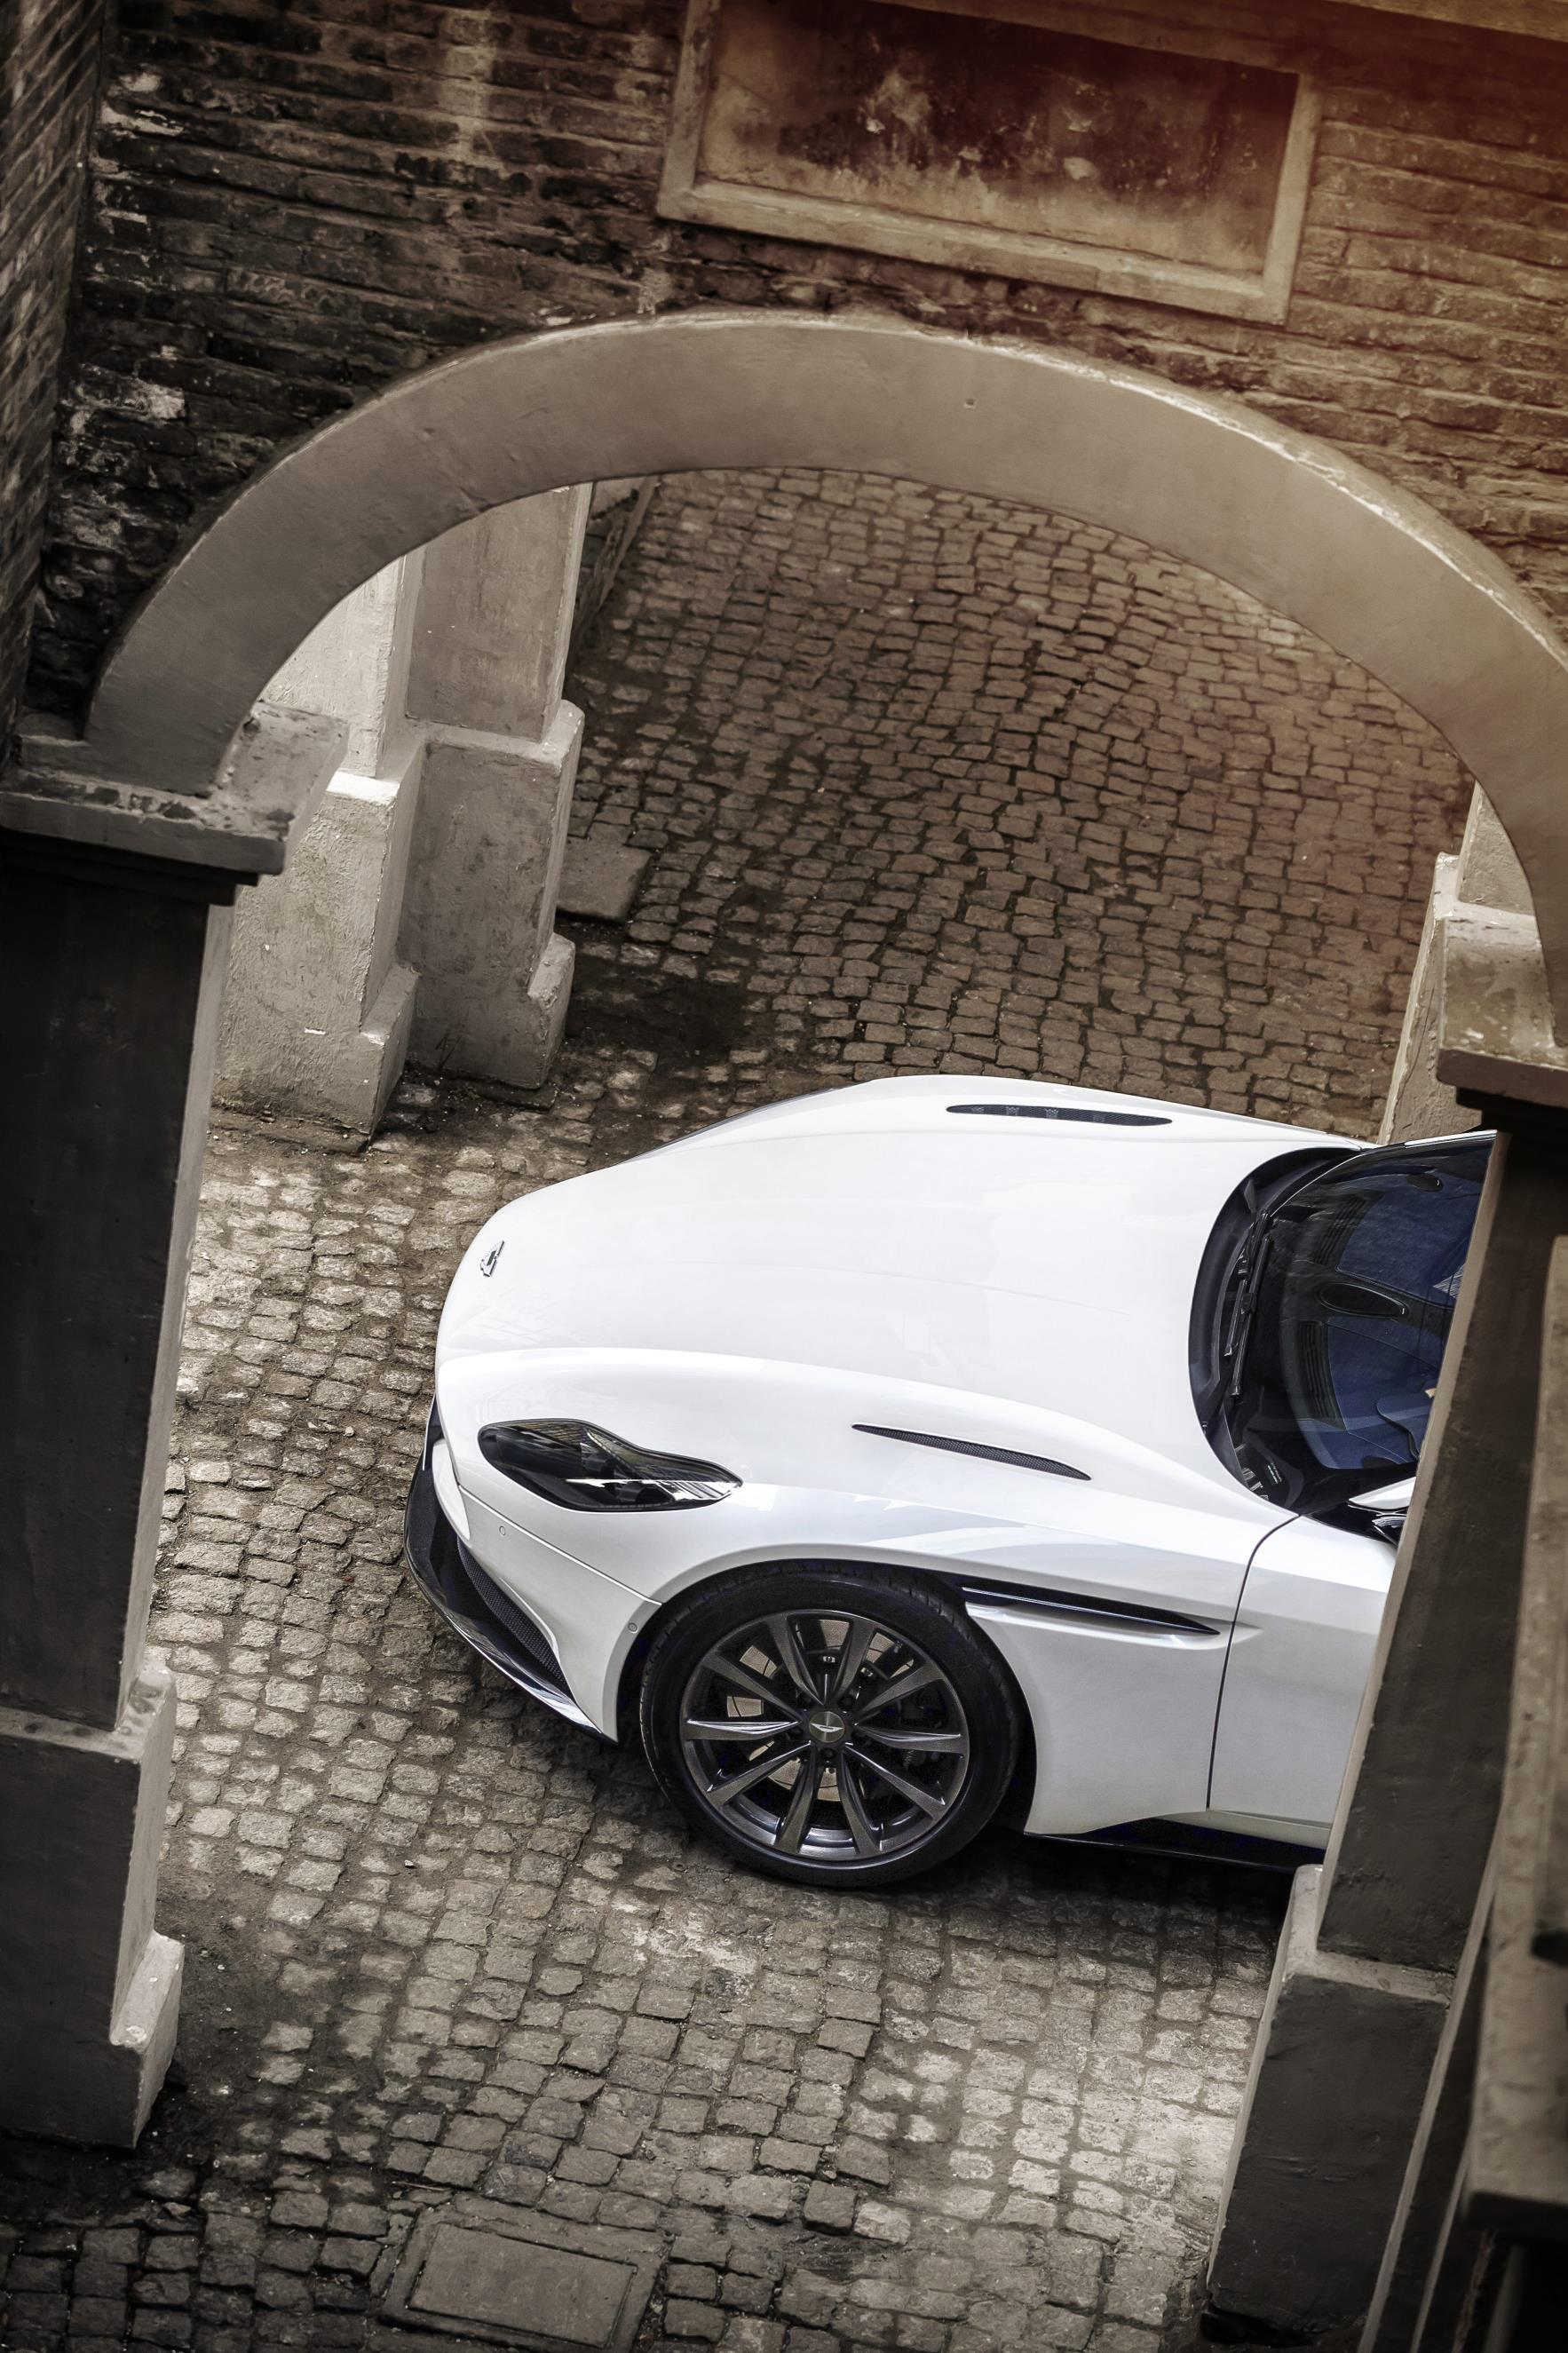 2018 Aston Martin DB11 Gains 4.0L Twin-Turbo V8 Engine ...